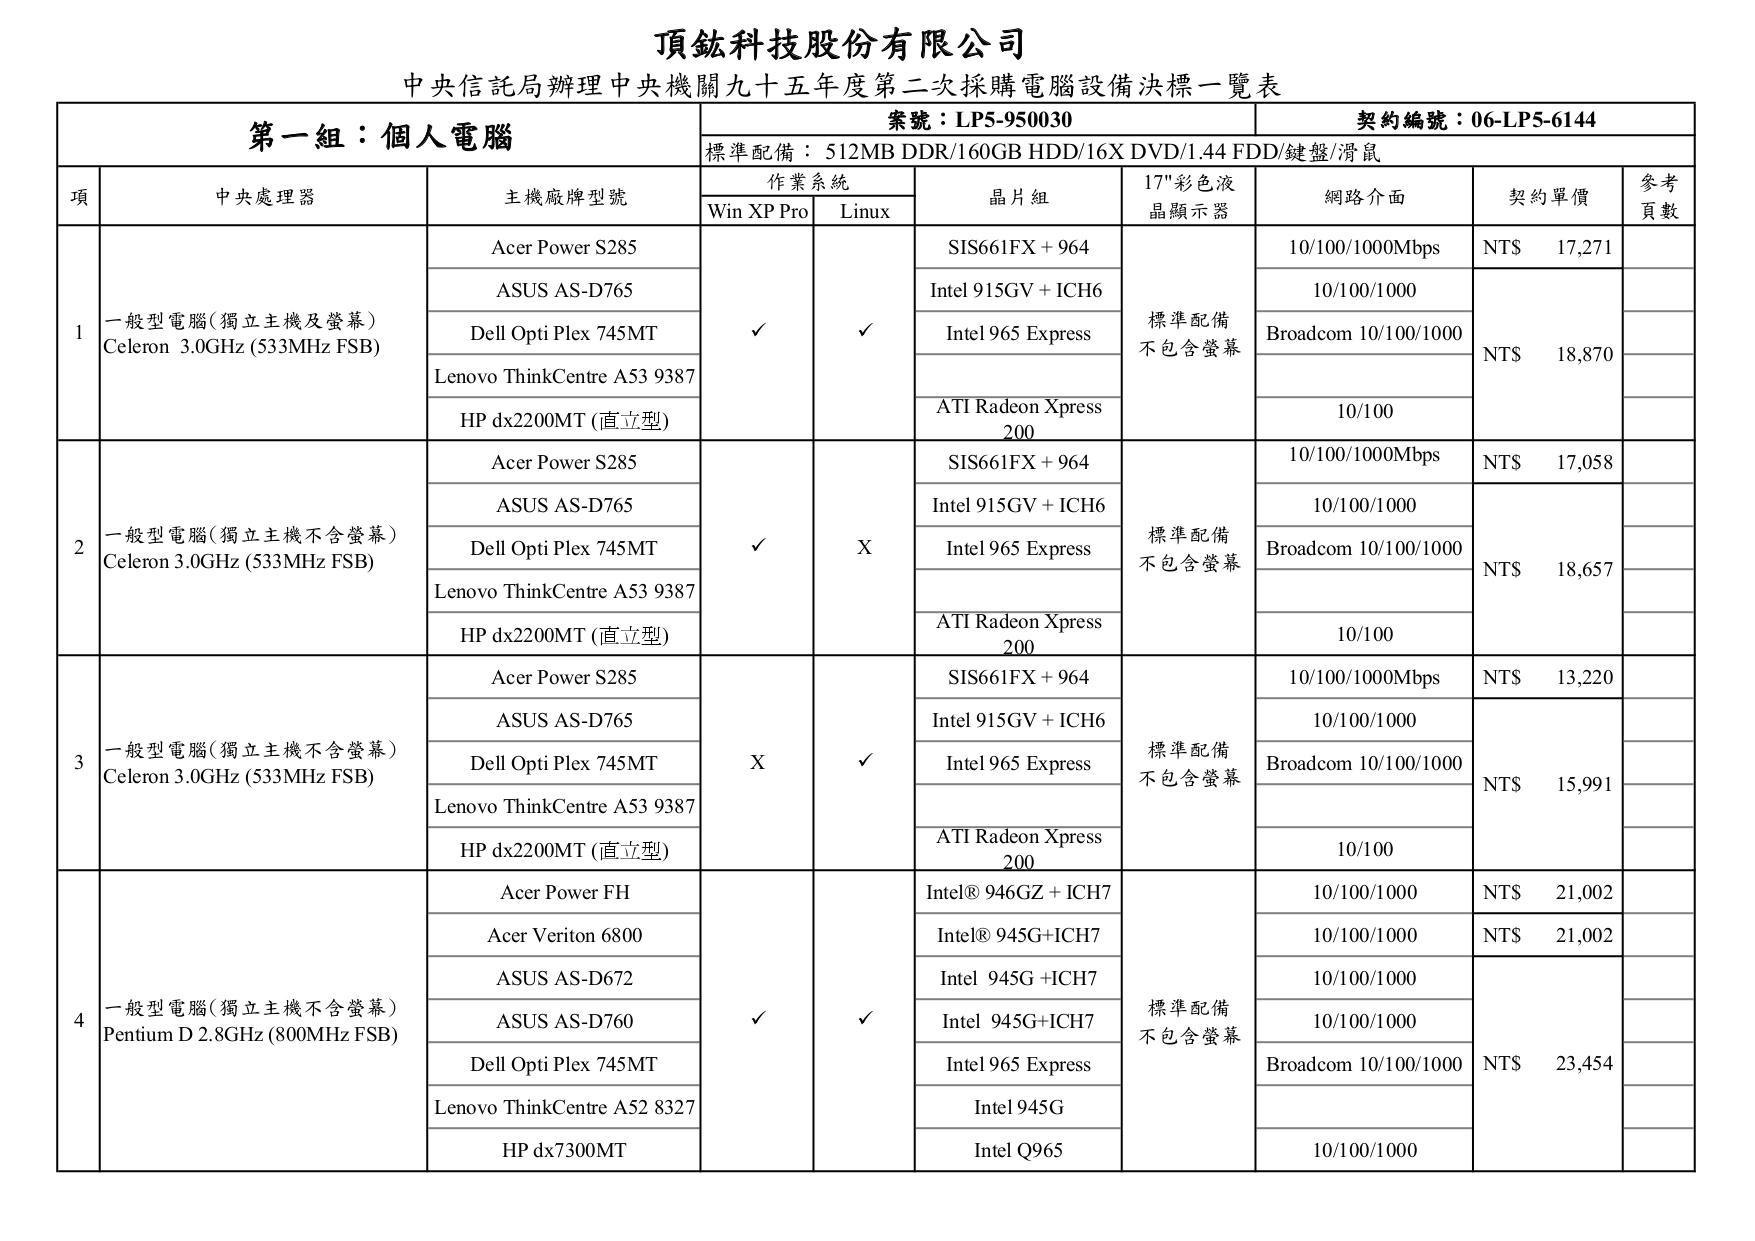 pdf for Lenovo Desktop ThinkCentre A52 8328 manual